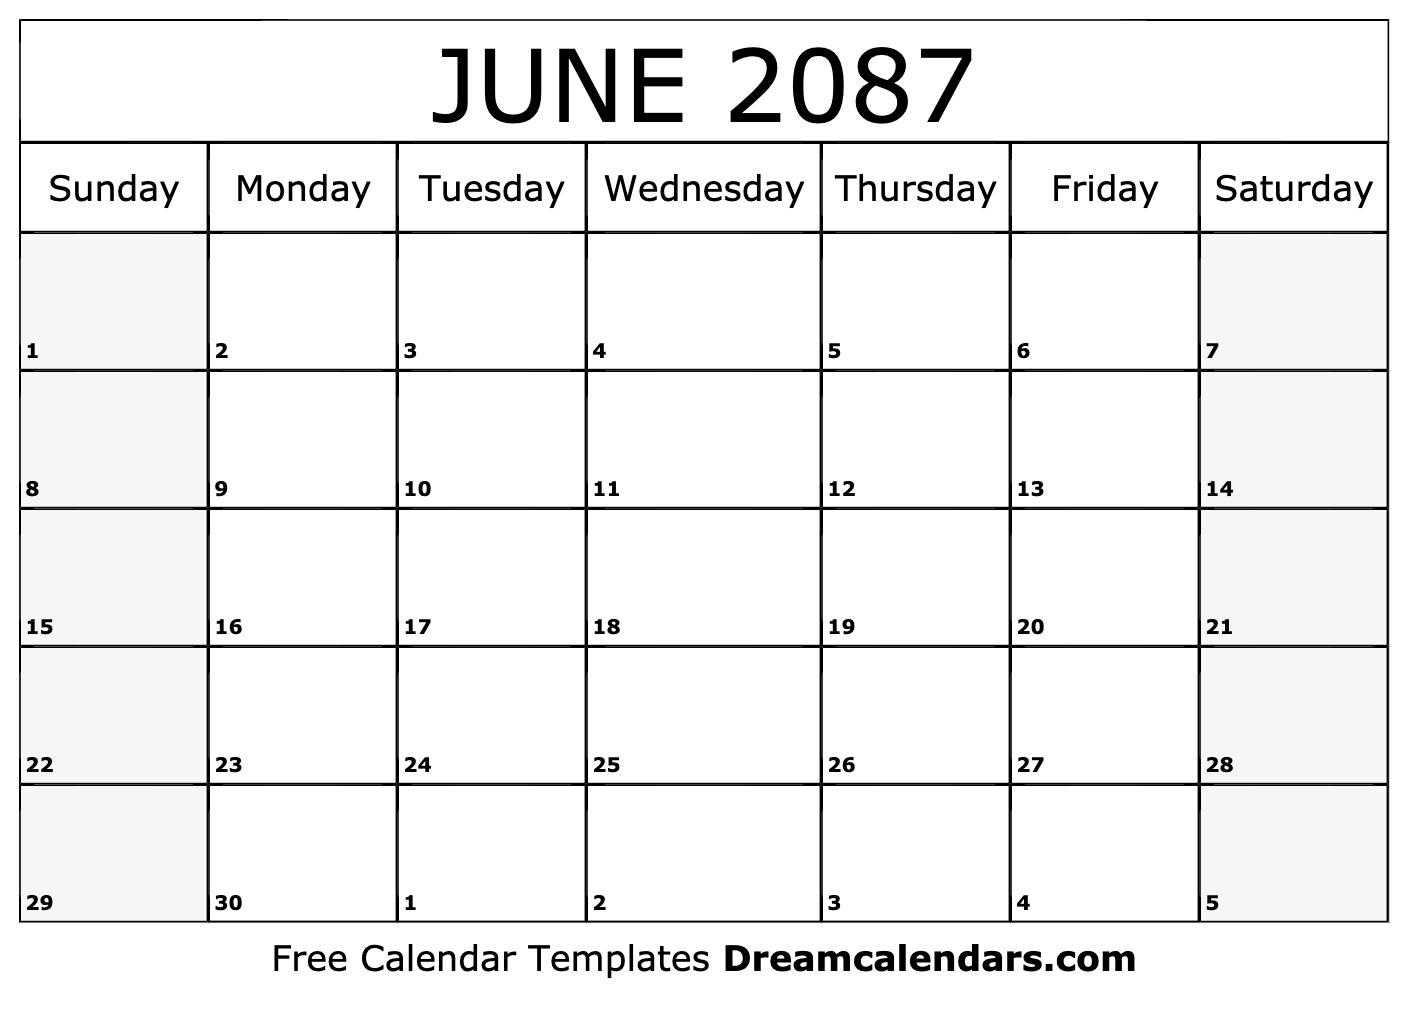 photo relating to Printable June Calendar identify Printable June 2087 Calendar